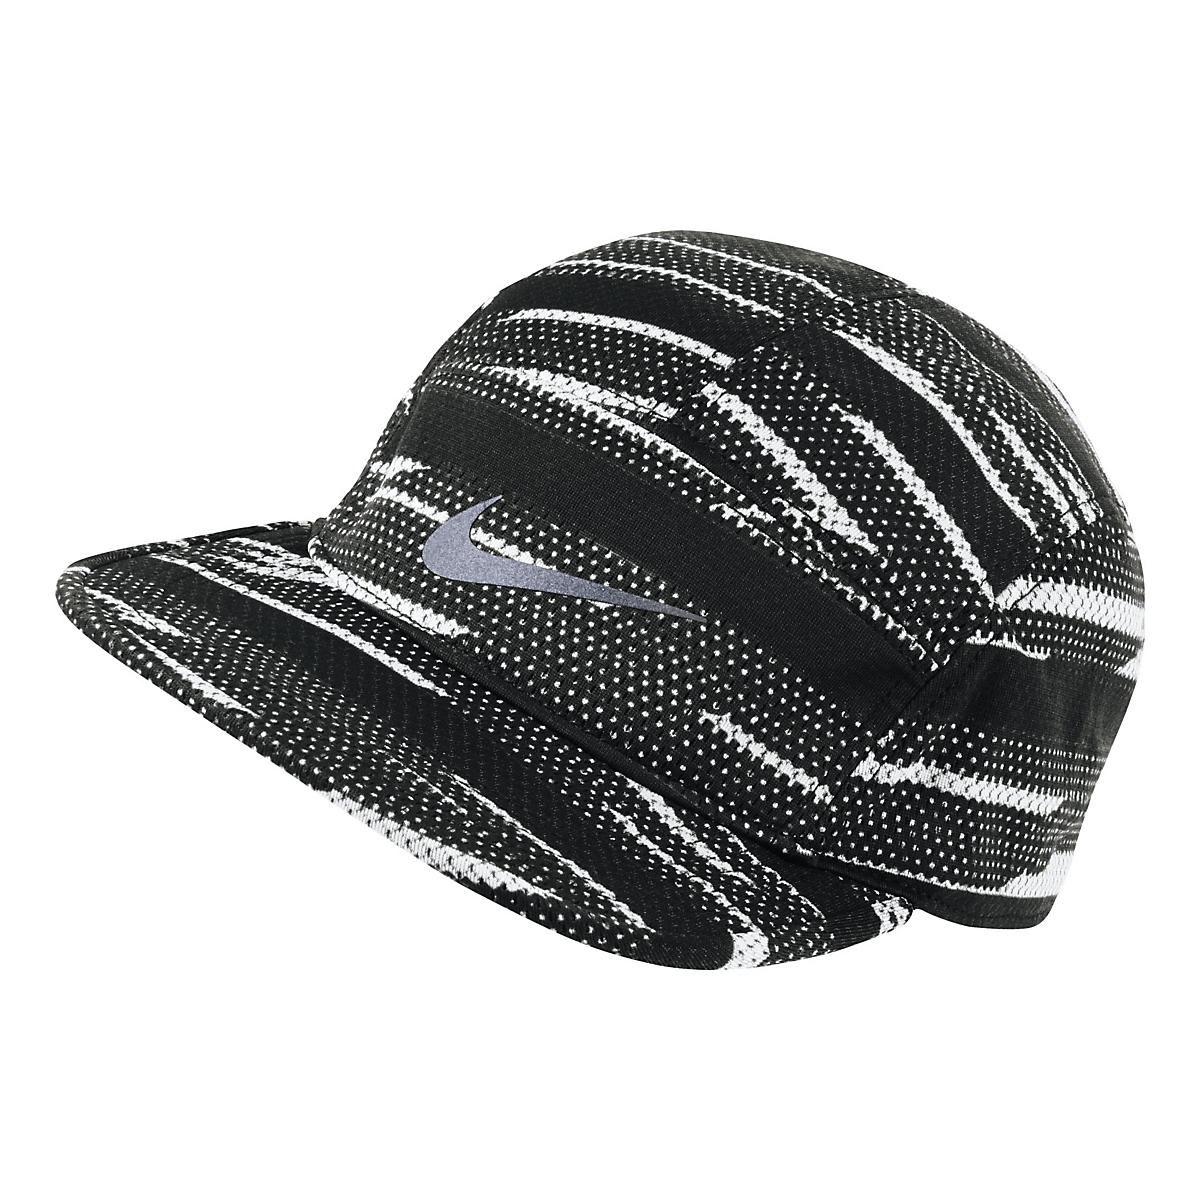 Nike Graphic AW84 Cap Headwear